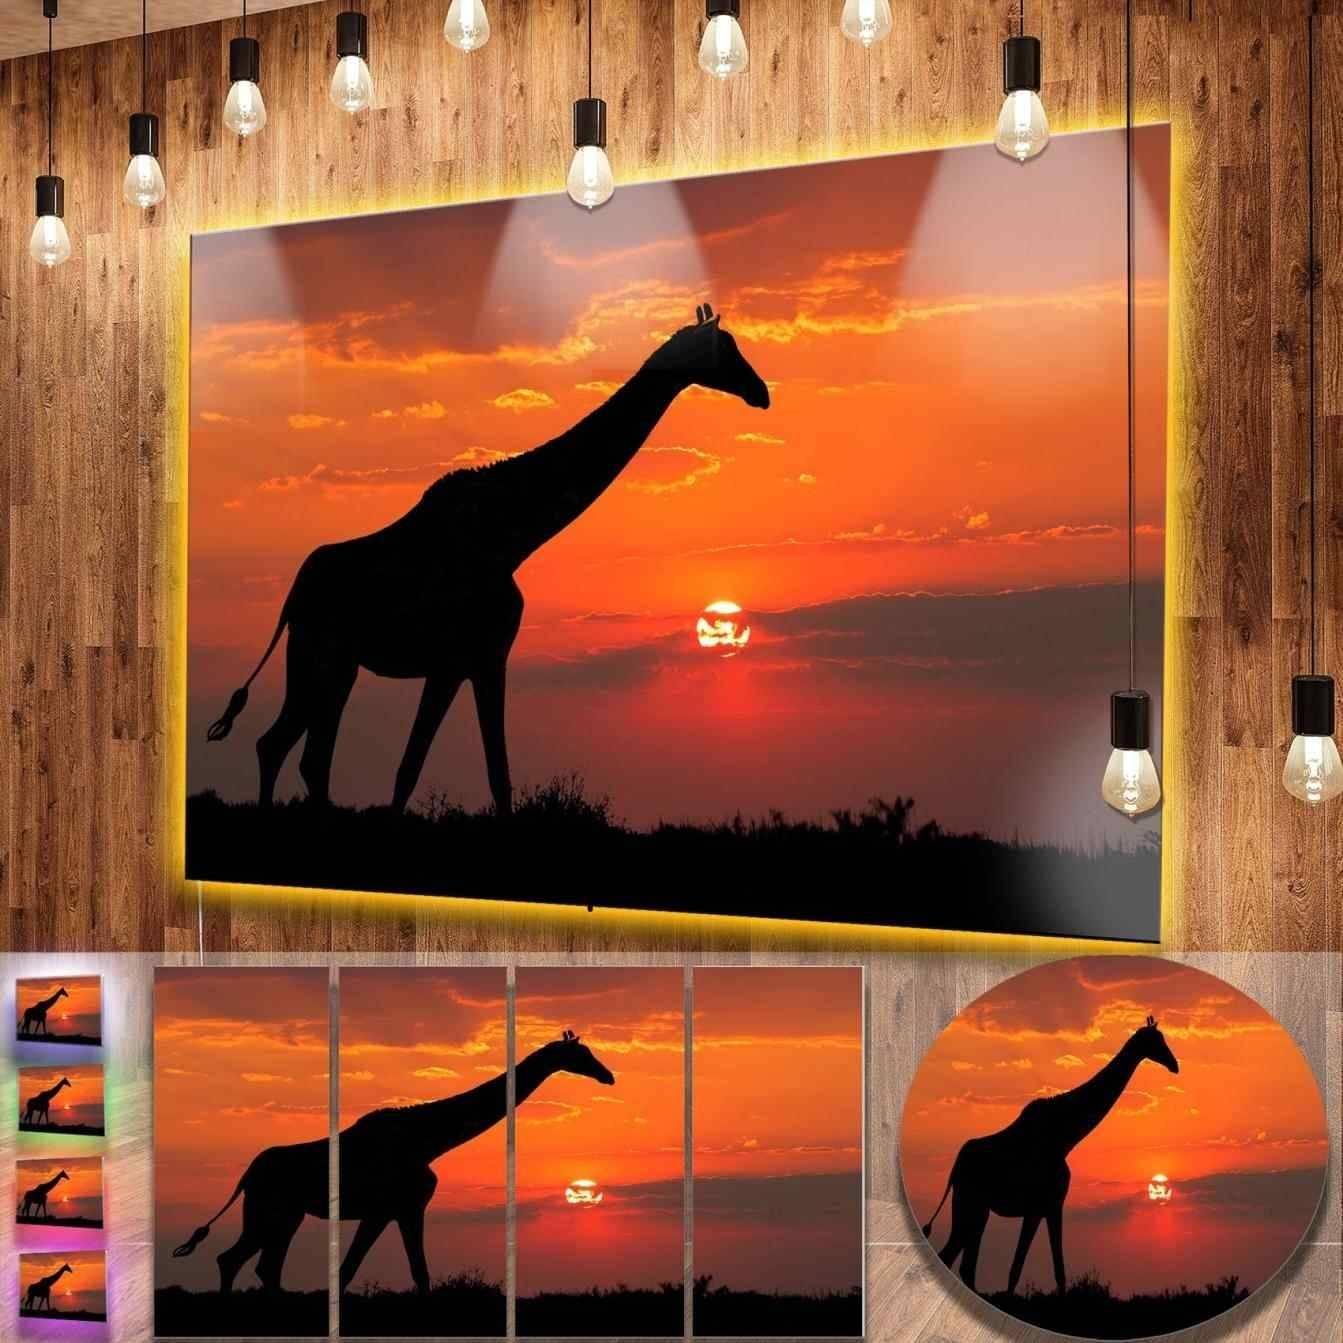 African Metal Wall Art Giraffe Savanna Contemporary Animal Graphic In 2017 Giraffe Metal Wall Art (View 2 of 20)